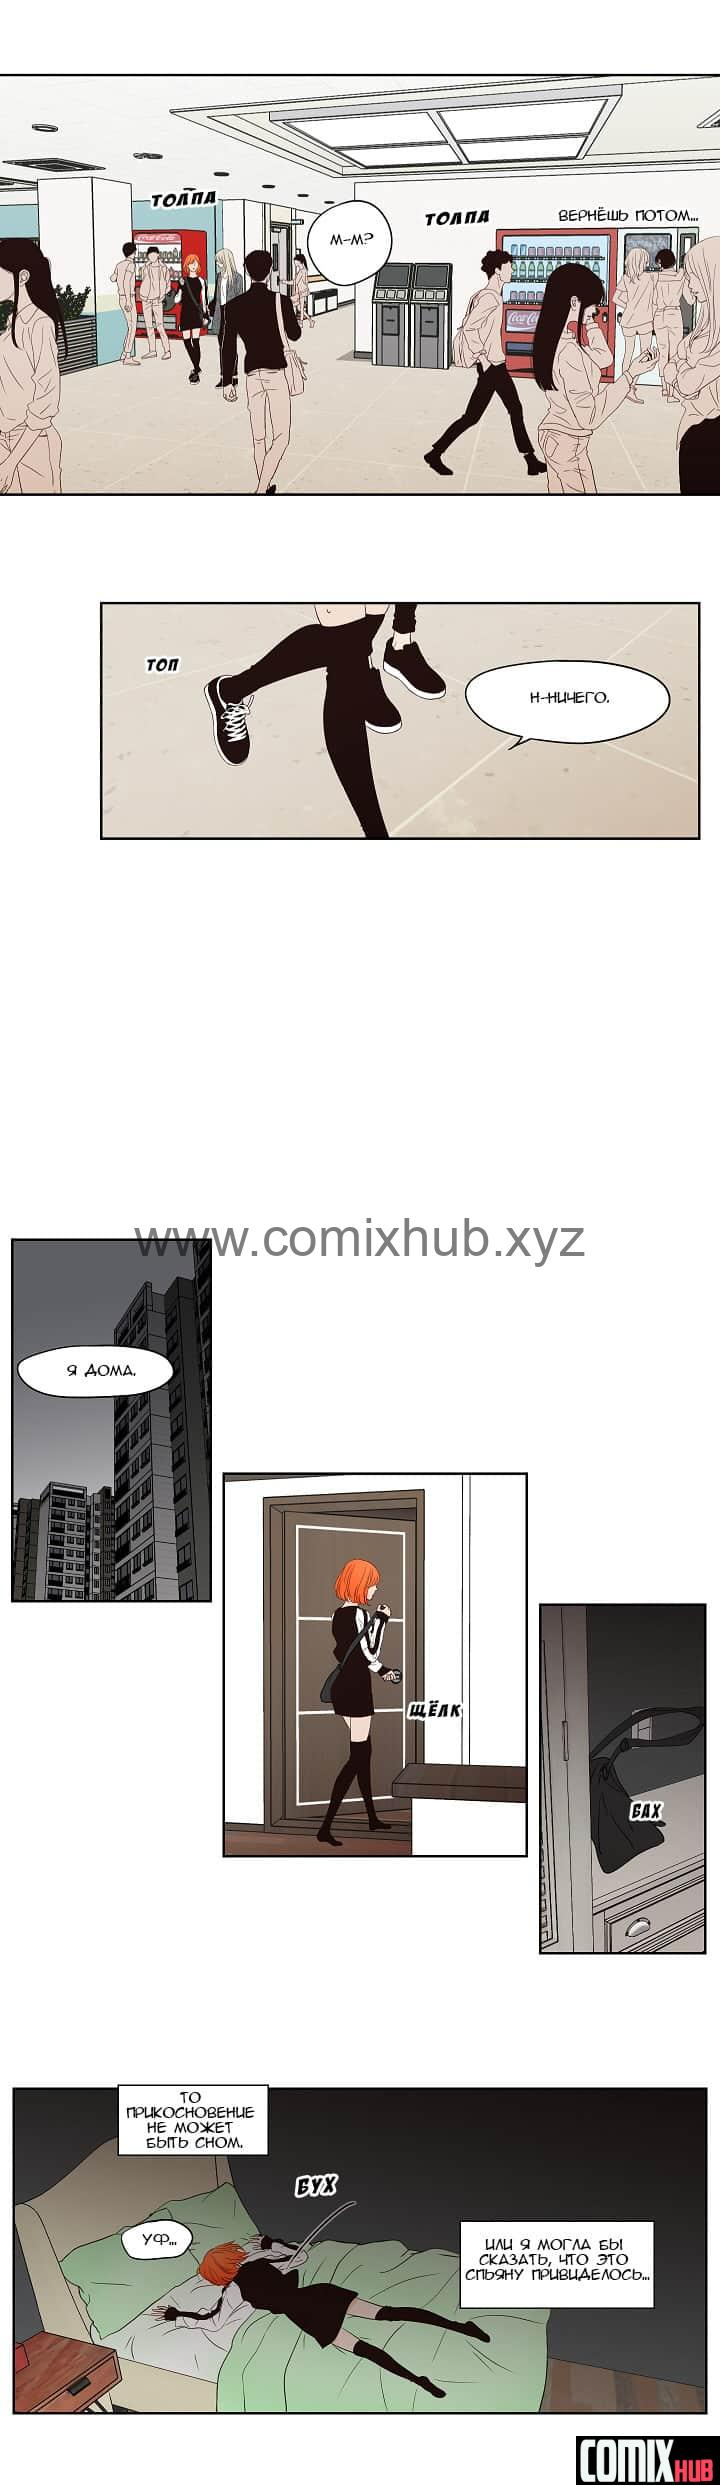 Манхва Эстетика Питомца, часть 5 Хентай манга, манхва, Лесбиянки, Мастурбация